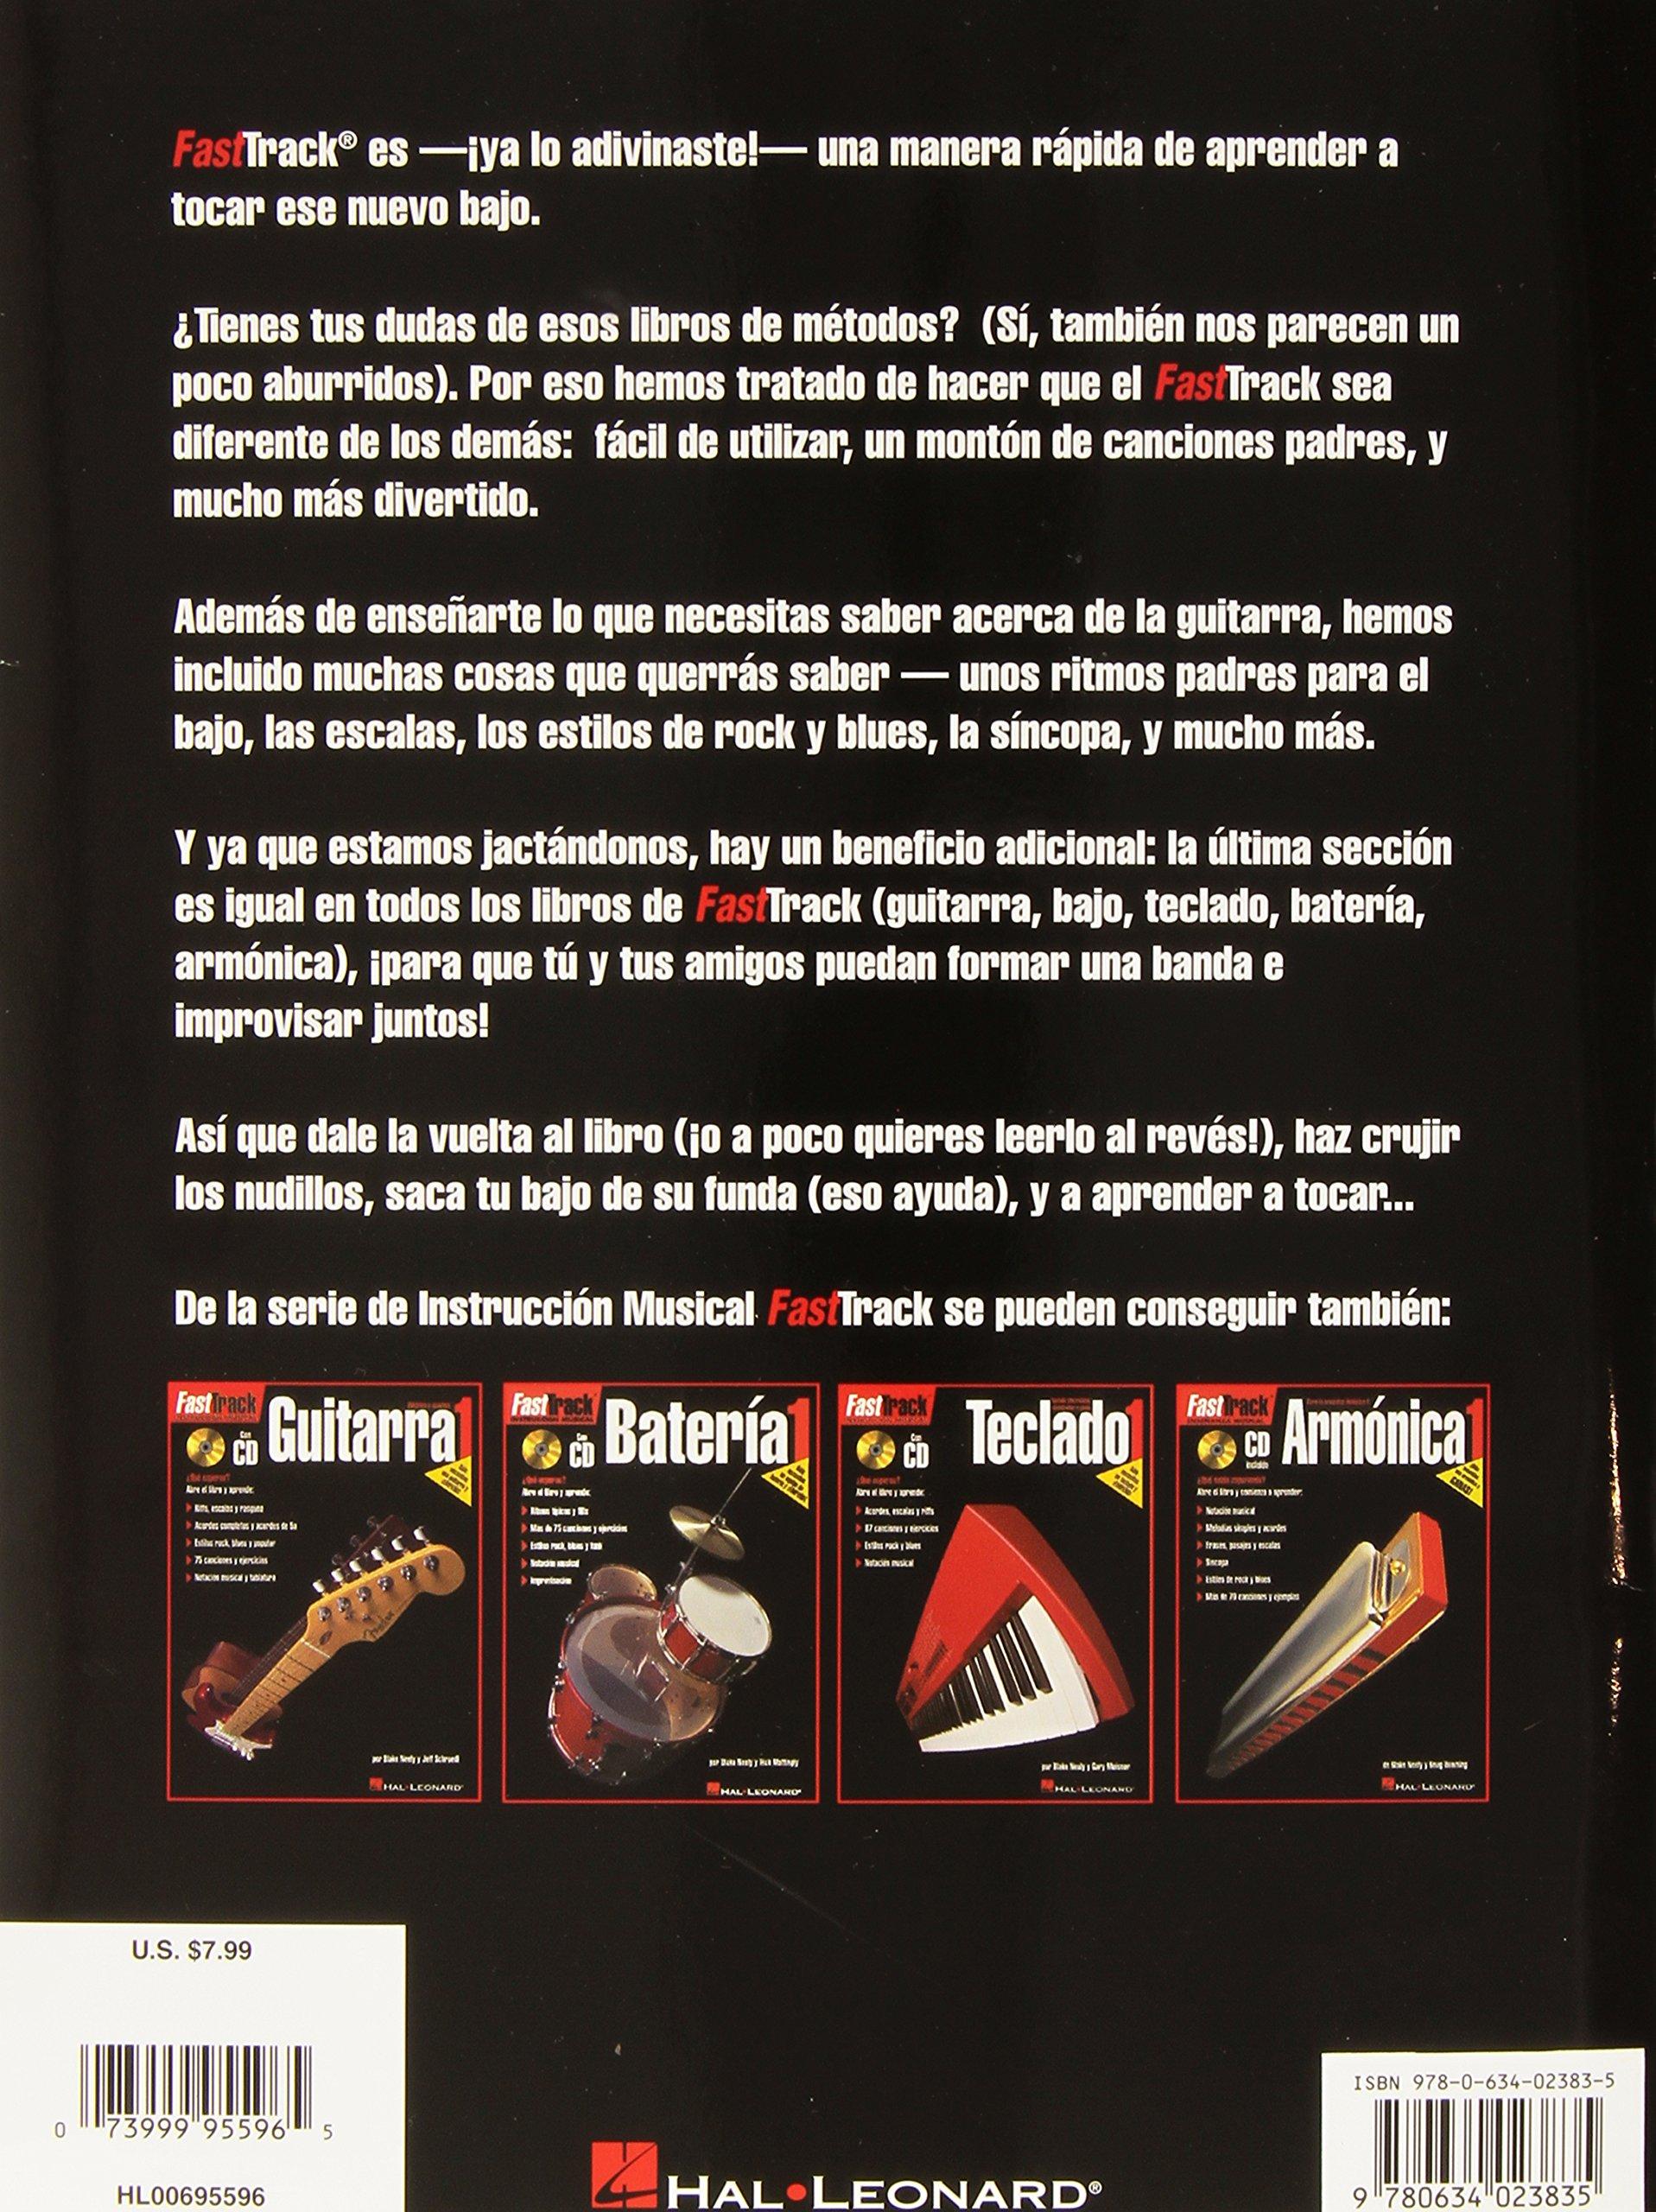 FastTrack Bass Method 1 - Spanish Edition: FastTrack Bajo 1: Blake Neely, Jeff Schroedl: 9780634023835: Amazon.com: Books